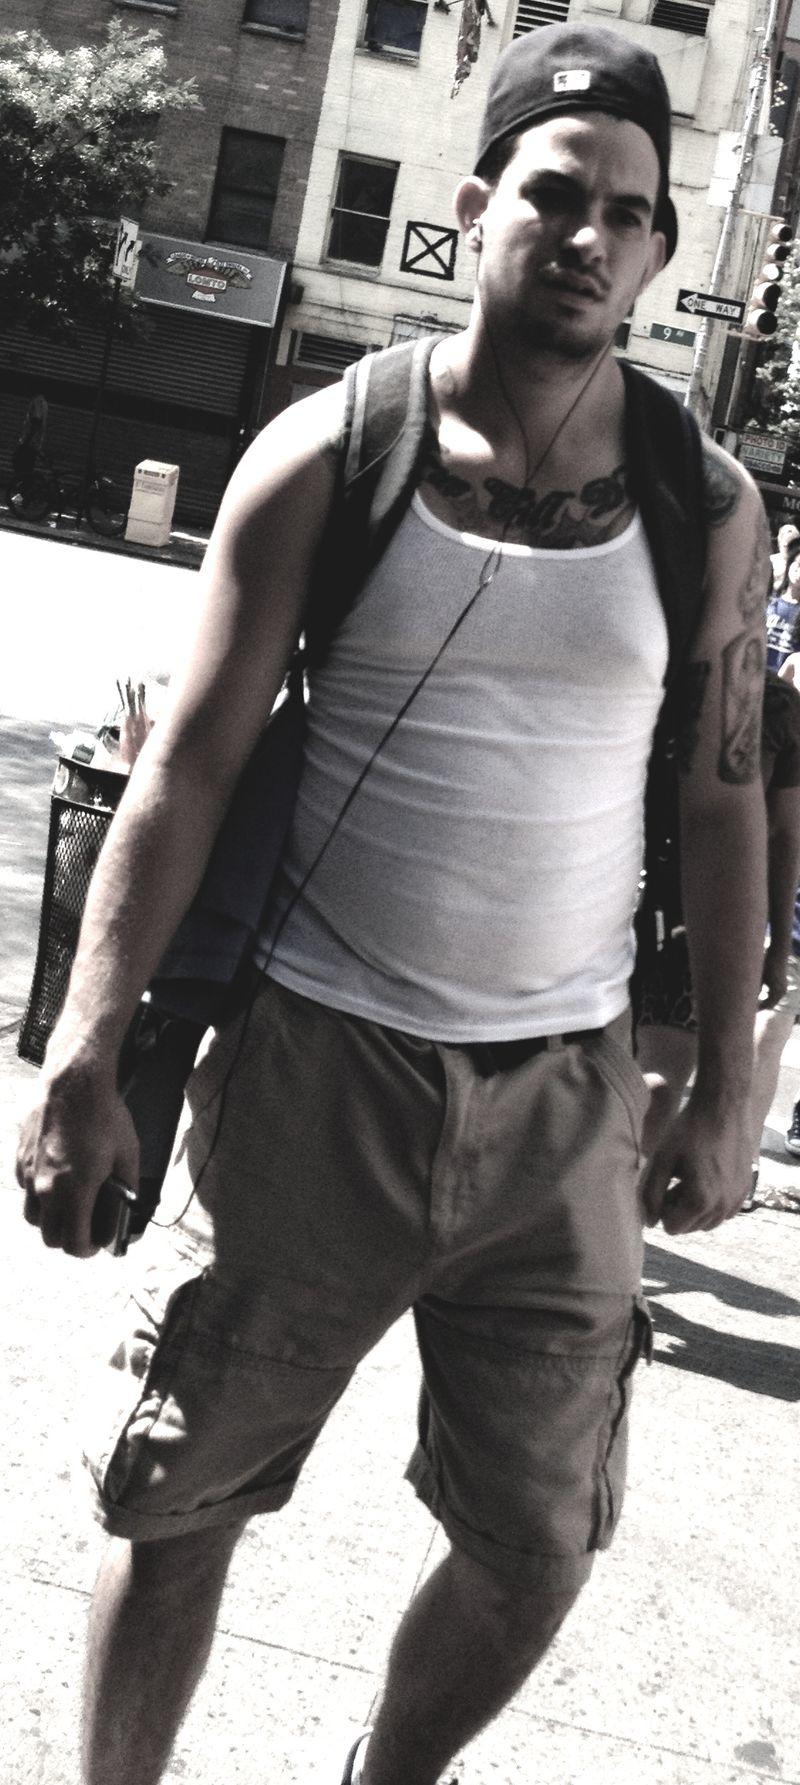 Very sexy tattooed man